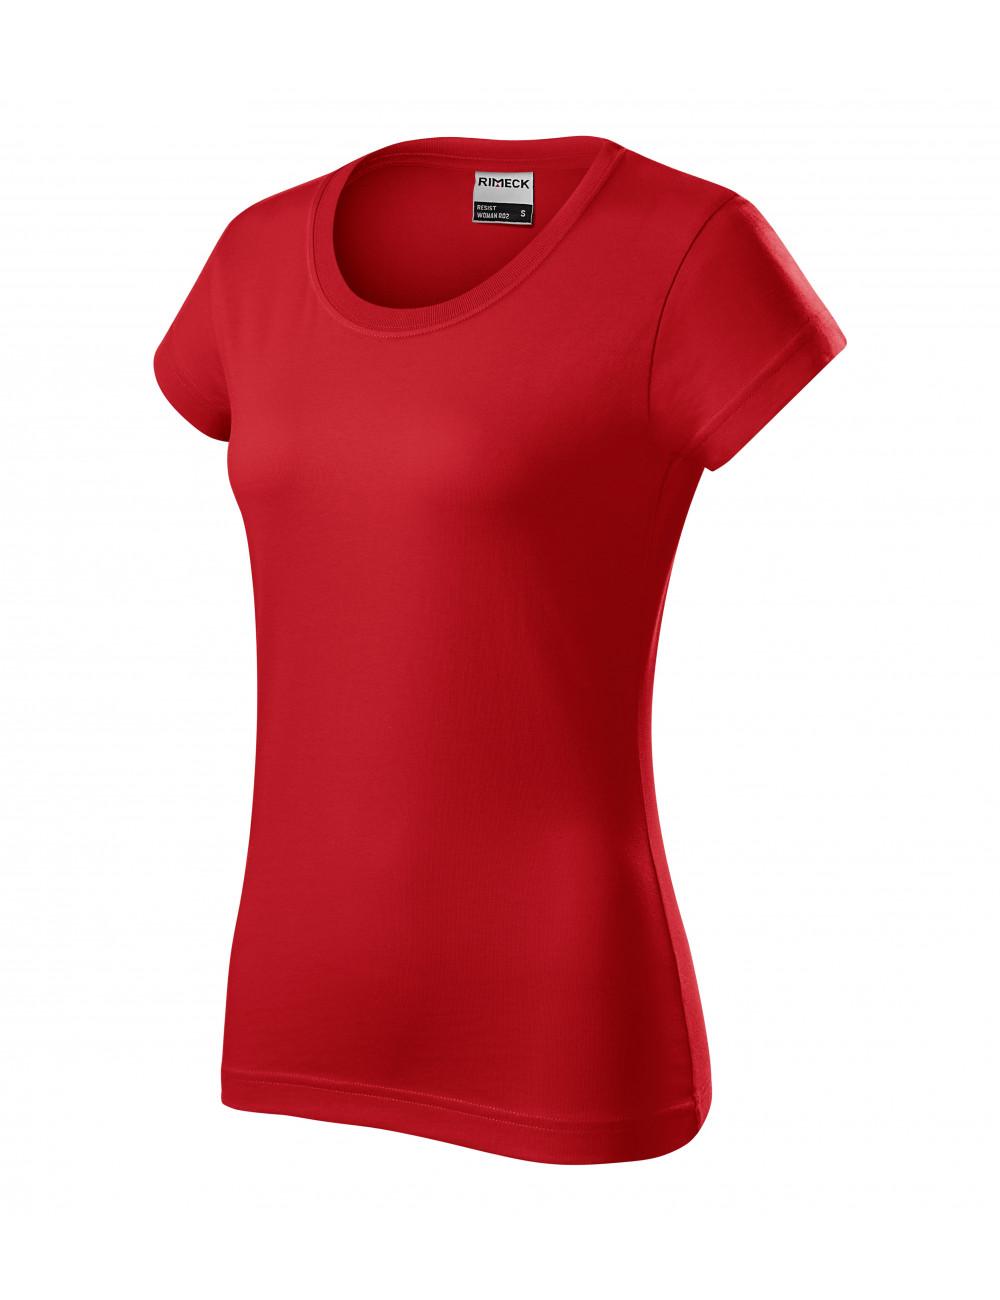 Adler RIMECK Koszulka damska Resist heavy R04 czerwony